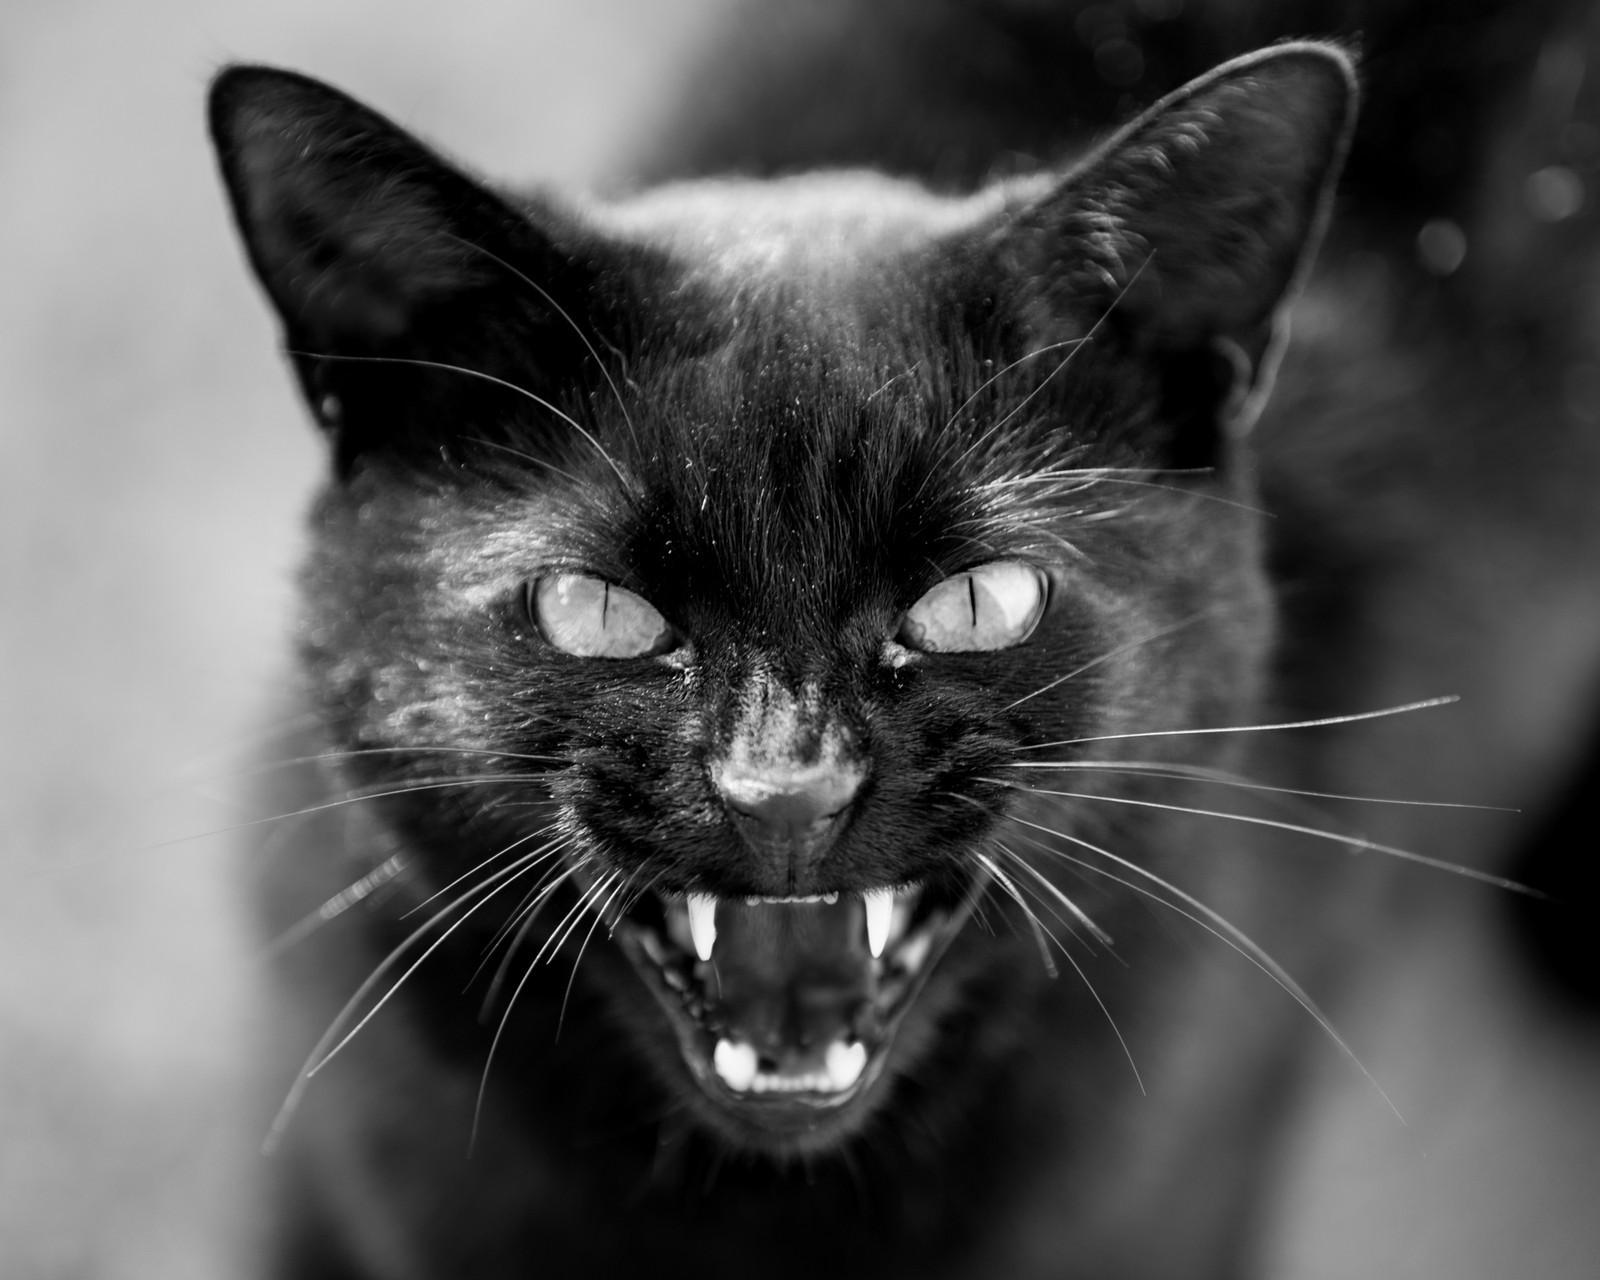 Scary Black Cat Video